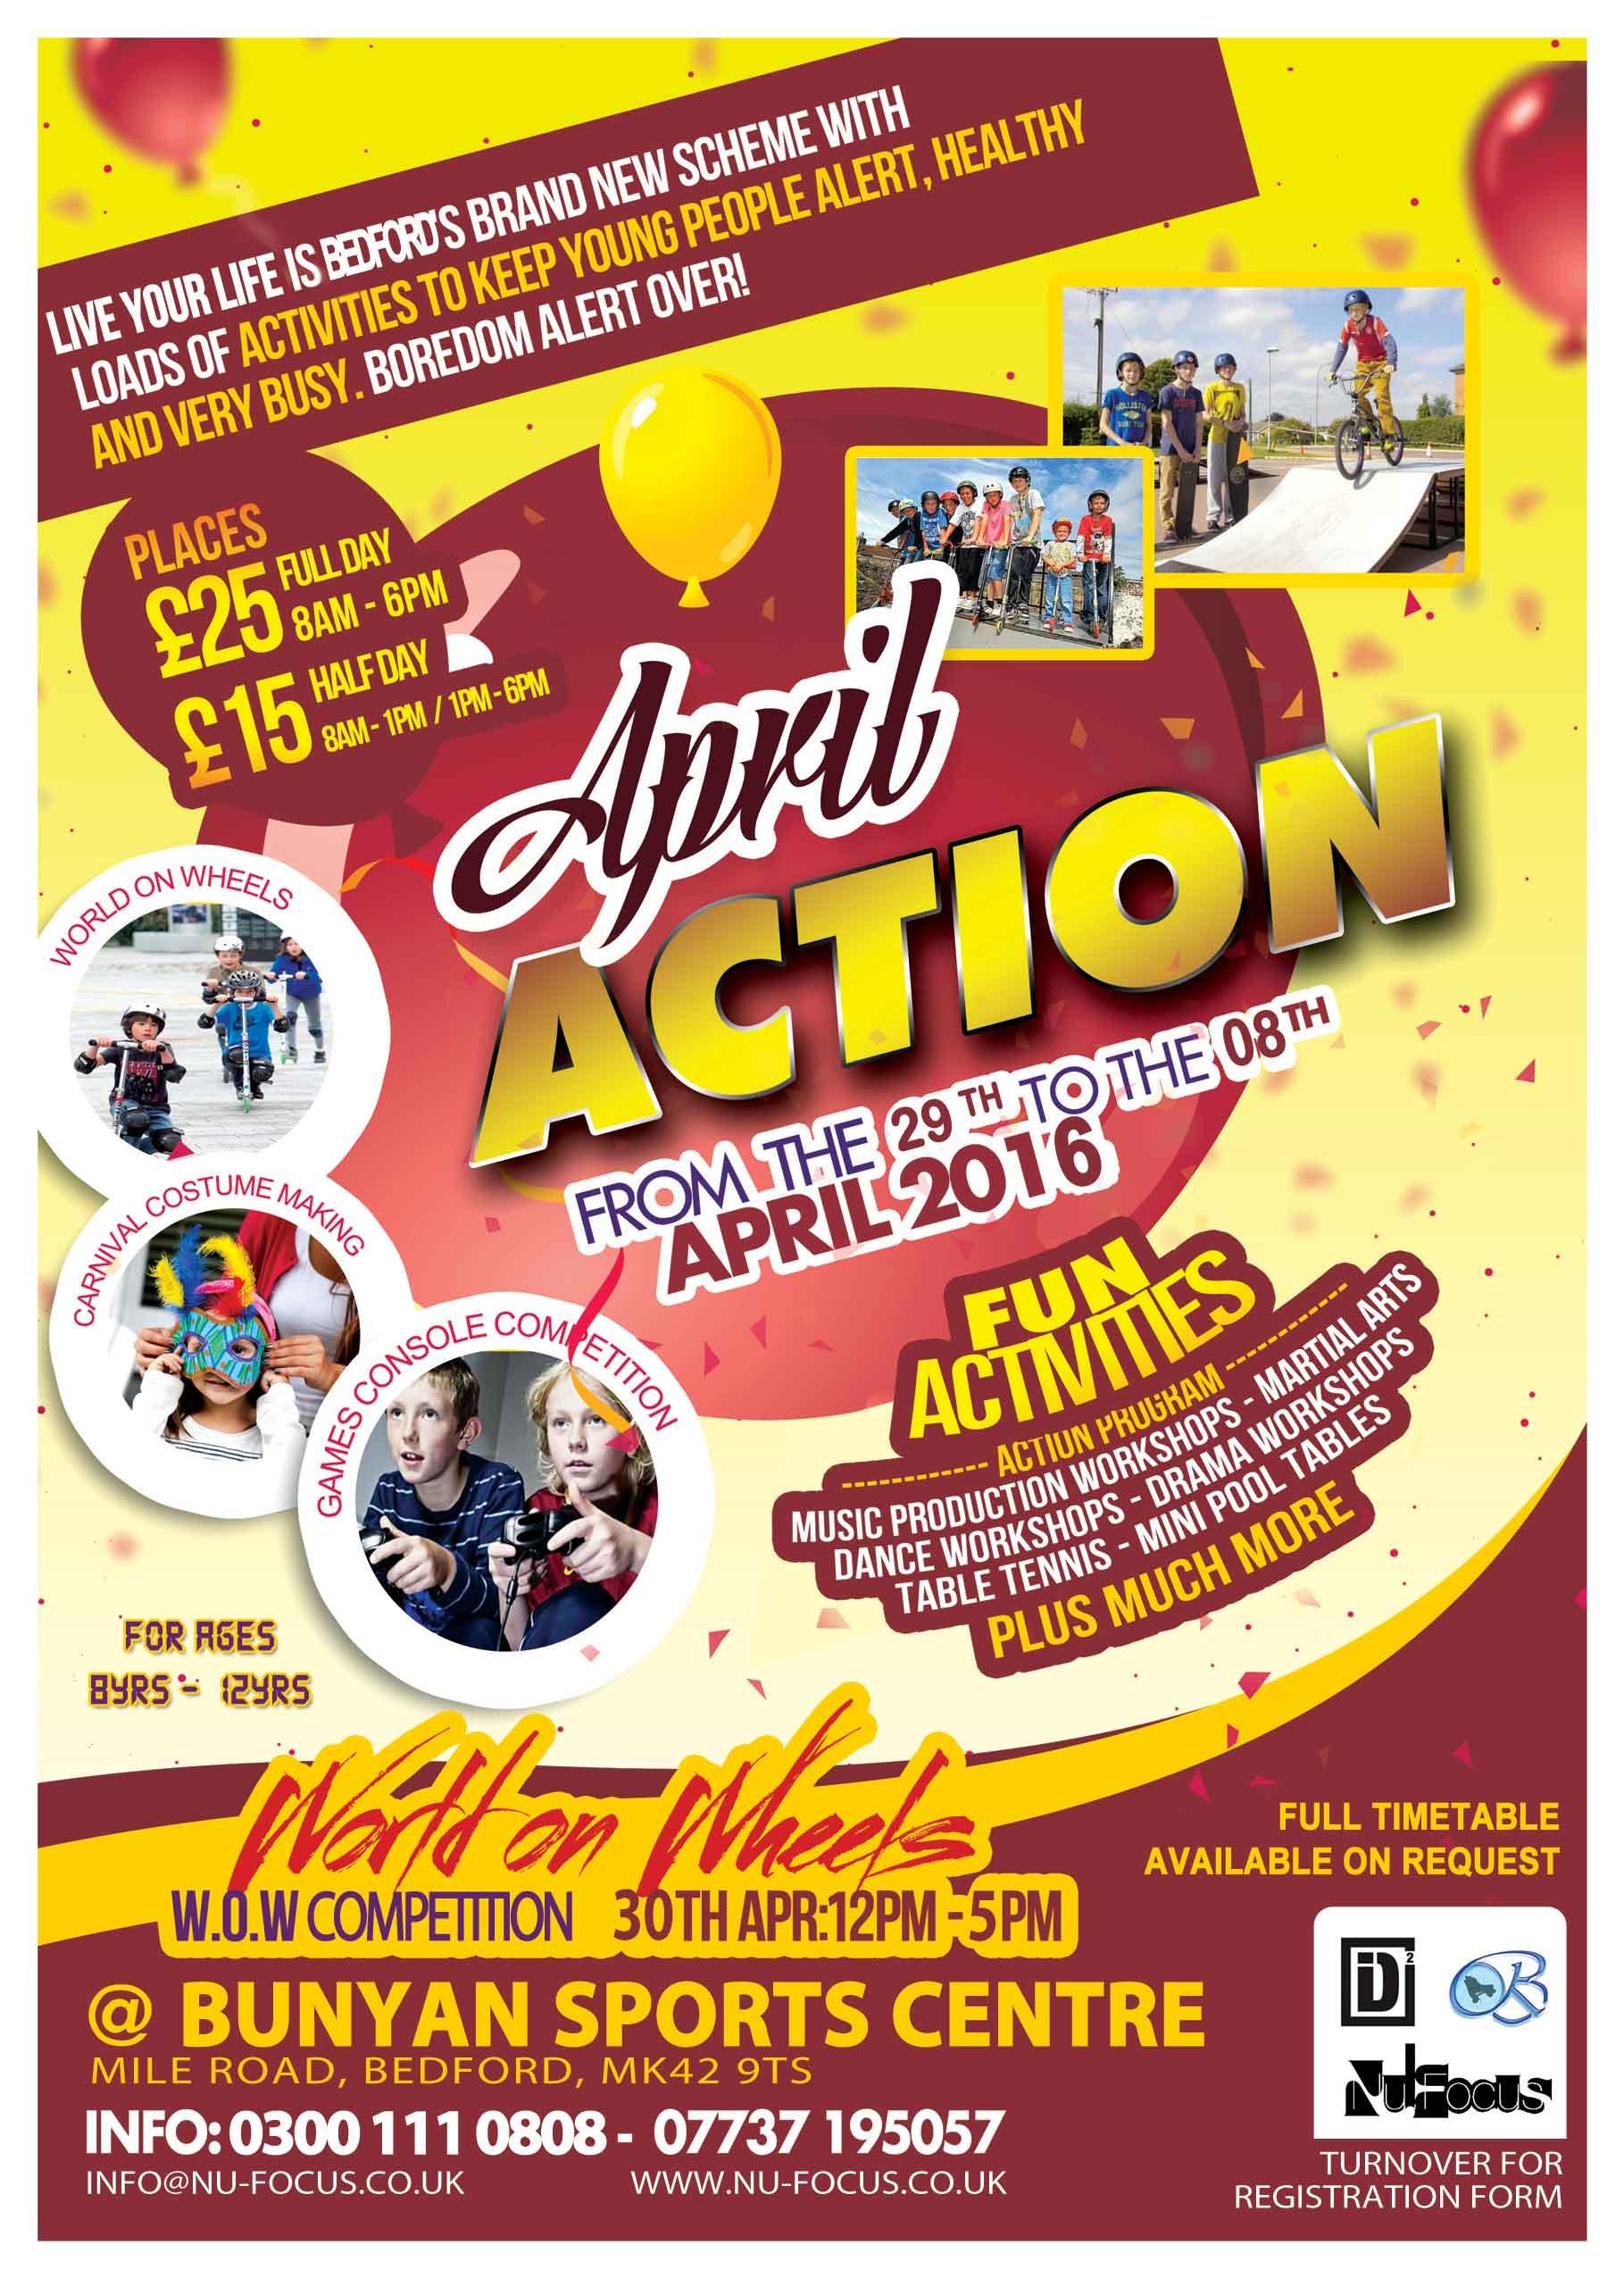 half-term-april-action-activities.jpg